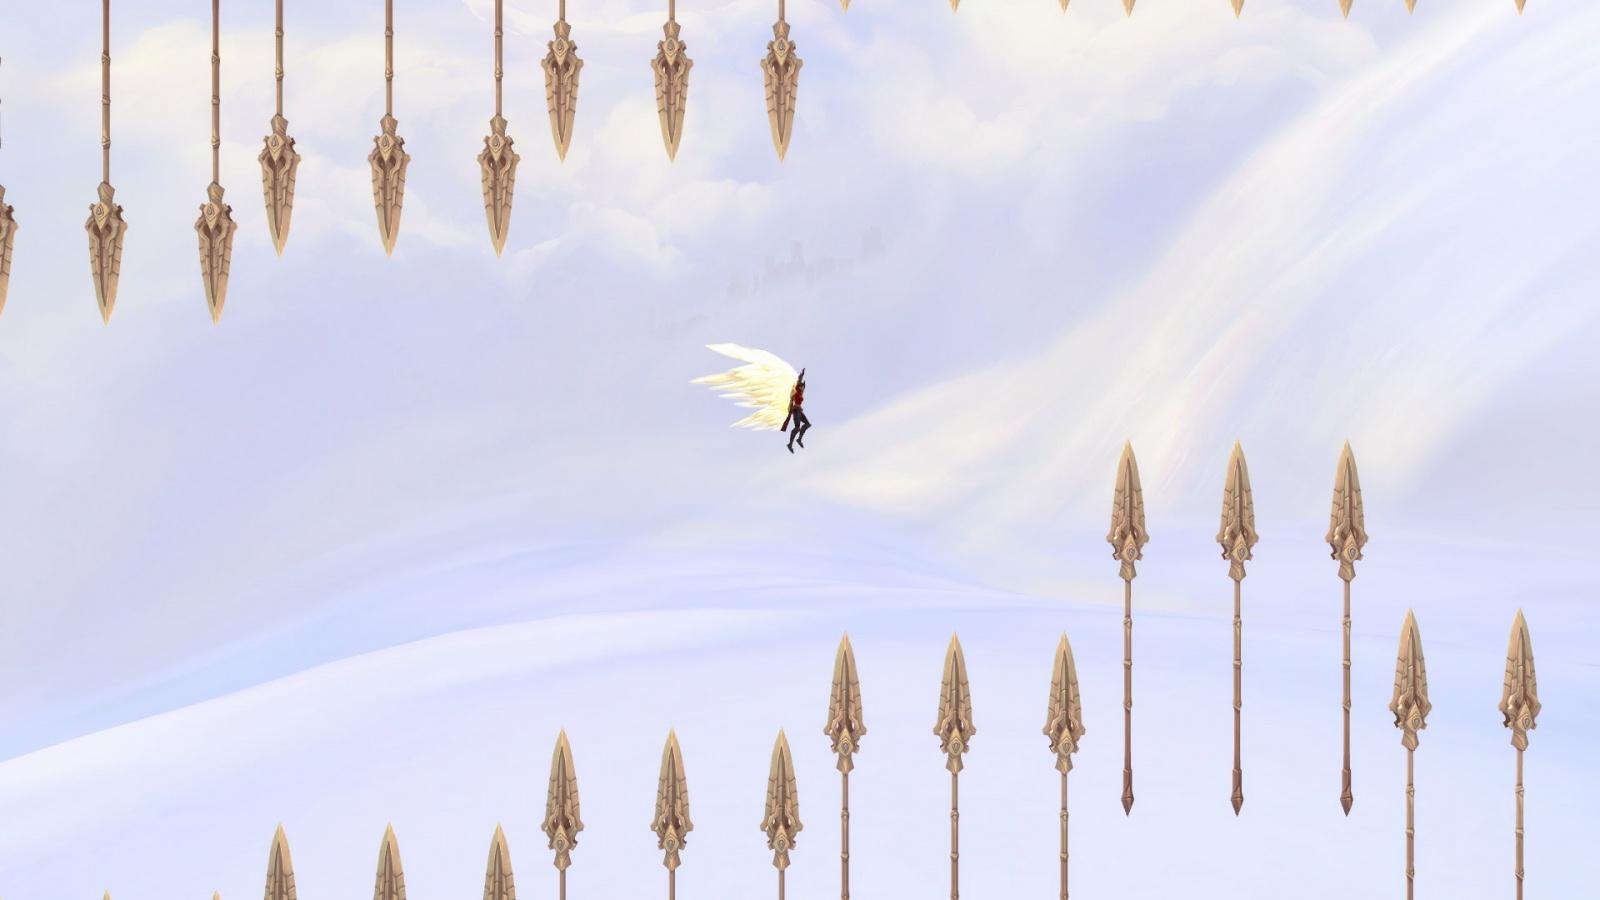 Flight School: Flapping Frenzy - Quest - World of Warcraft